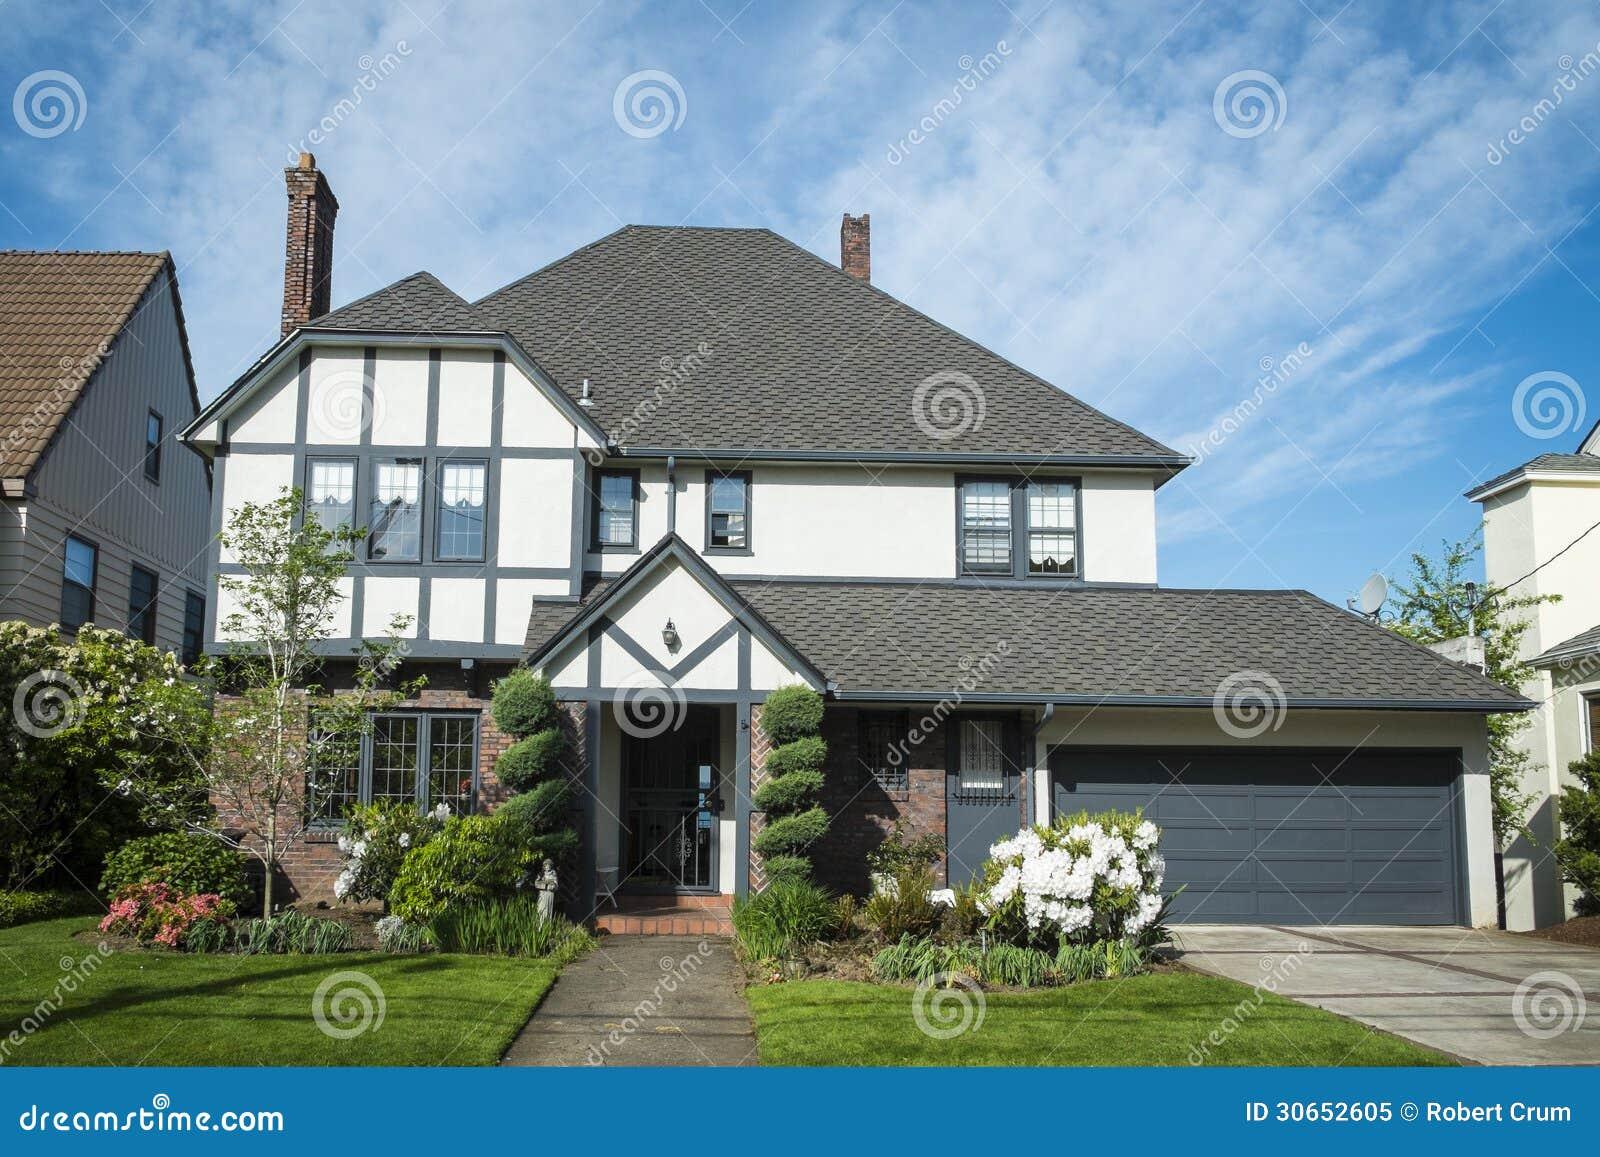 Classic American Suburban House Stock Image Image Of Single Dwelling 30652605